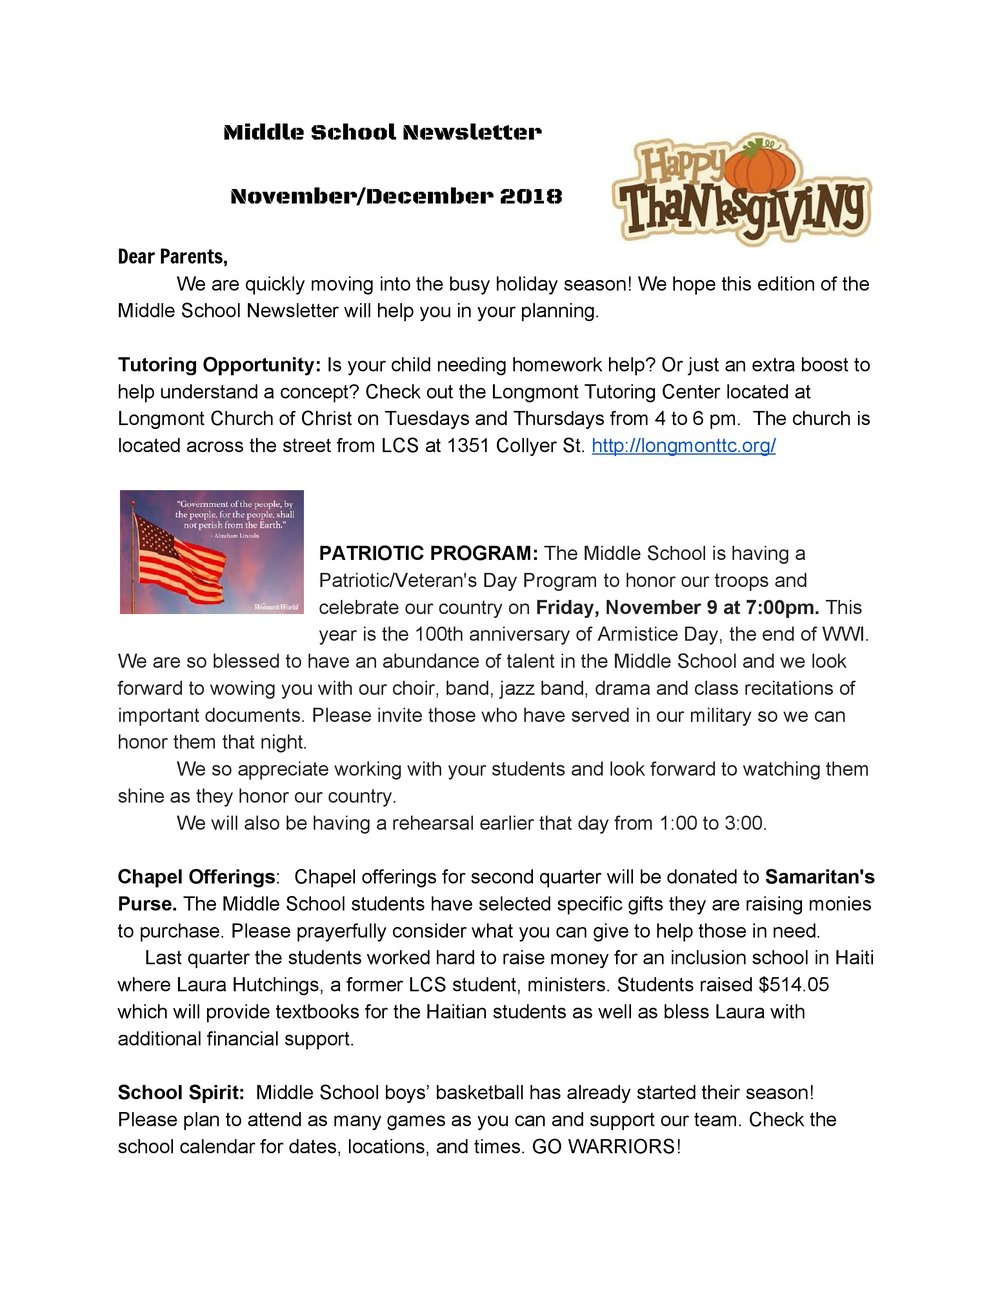 Nov.-Dec. Newsletter 2017 (1)-page-0.jpg